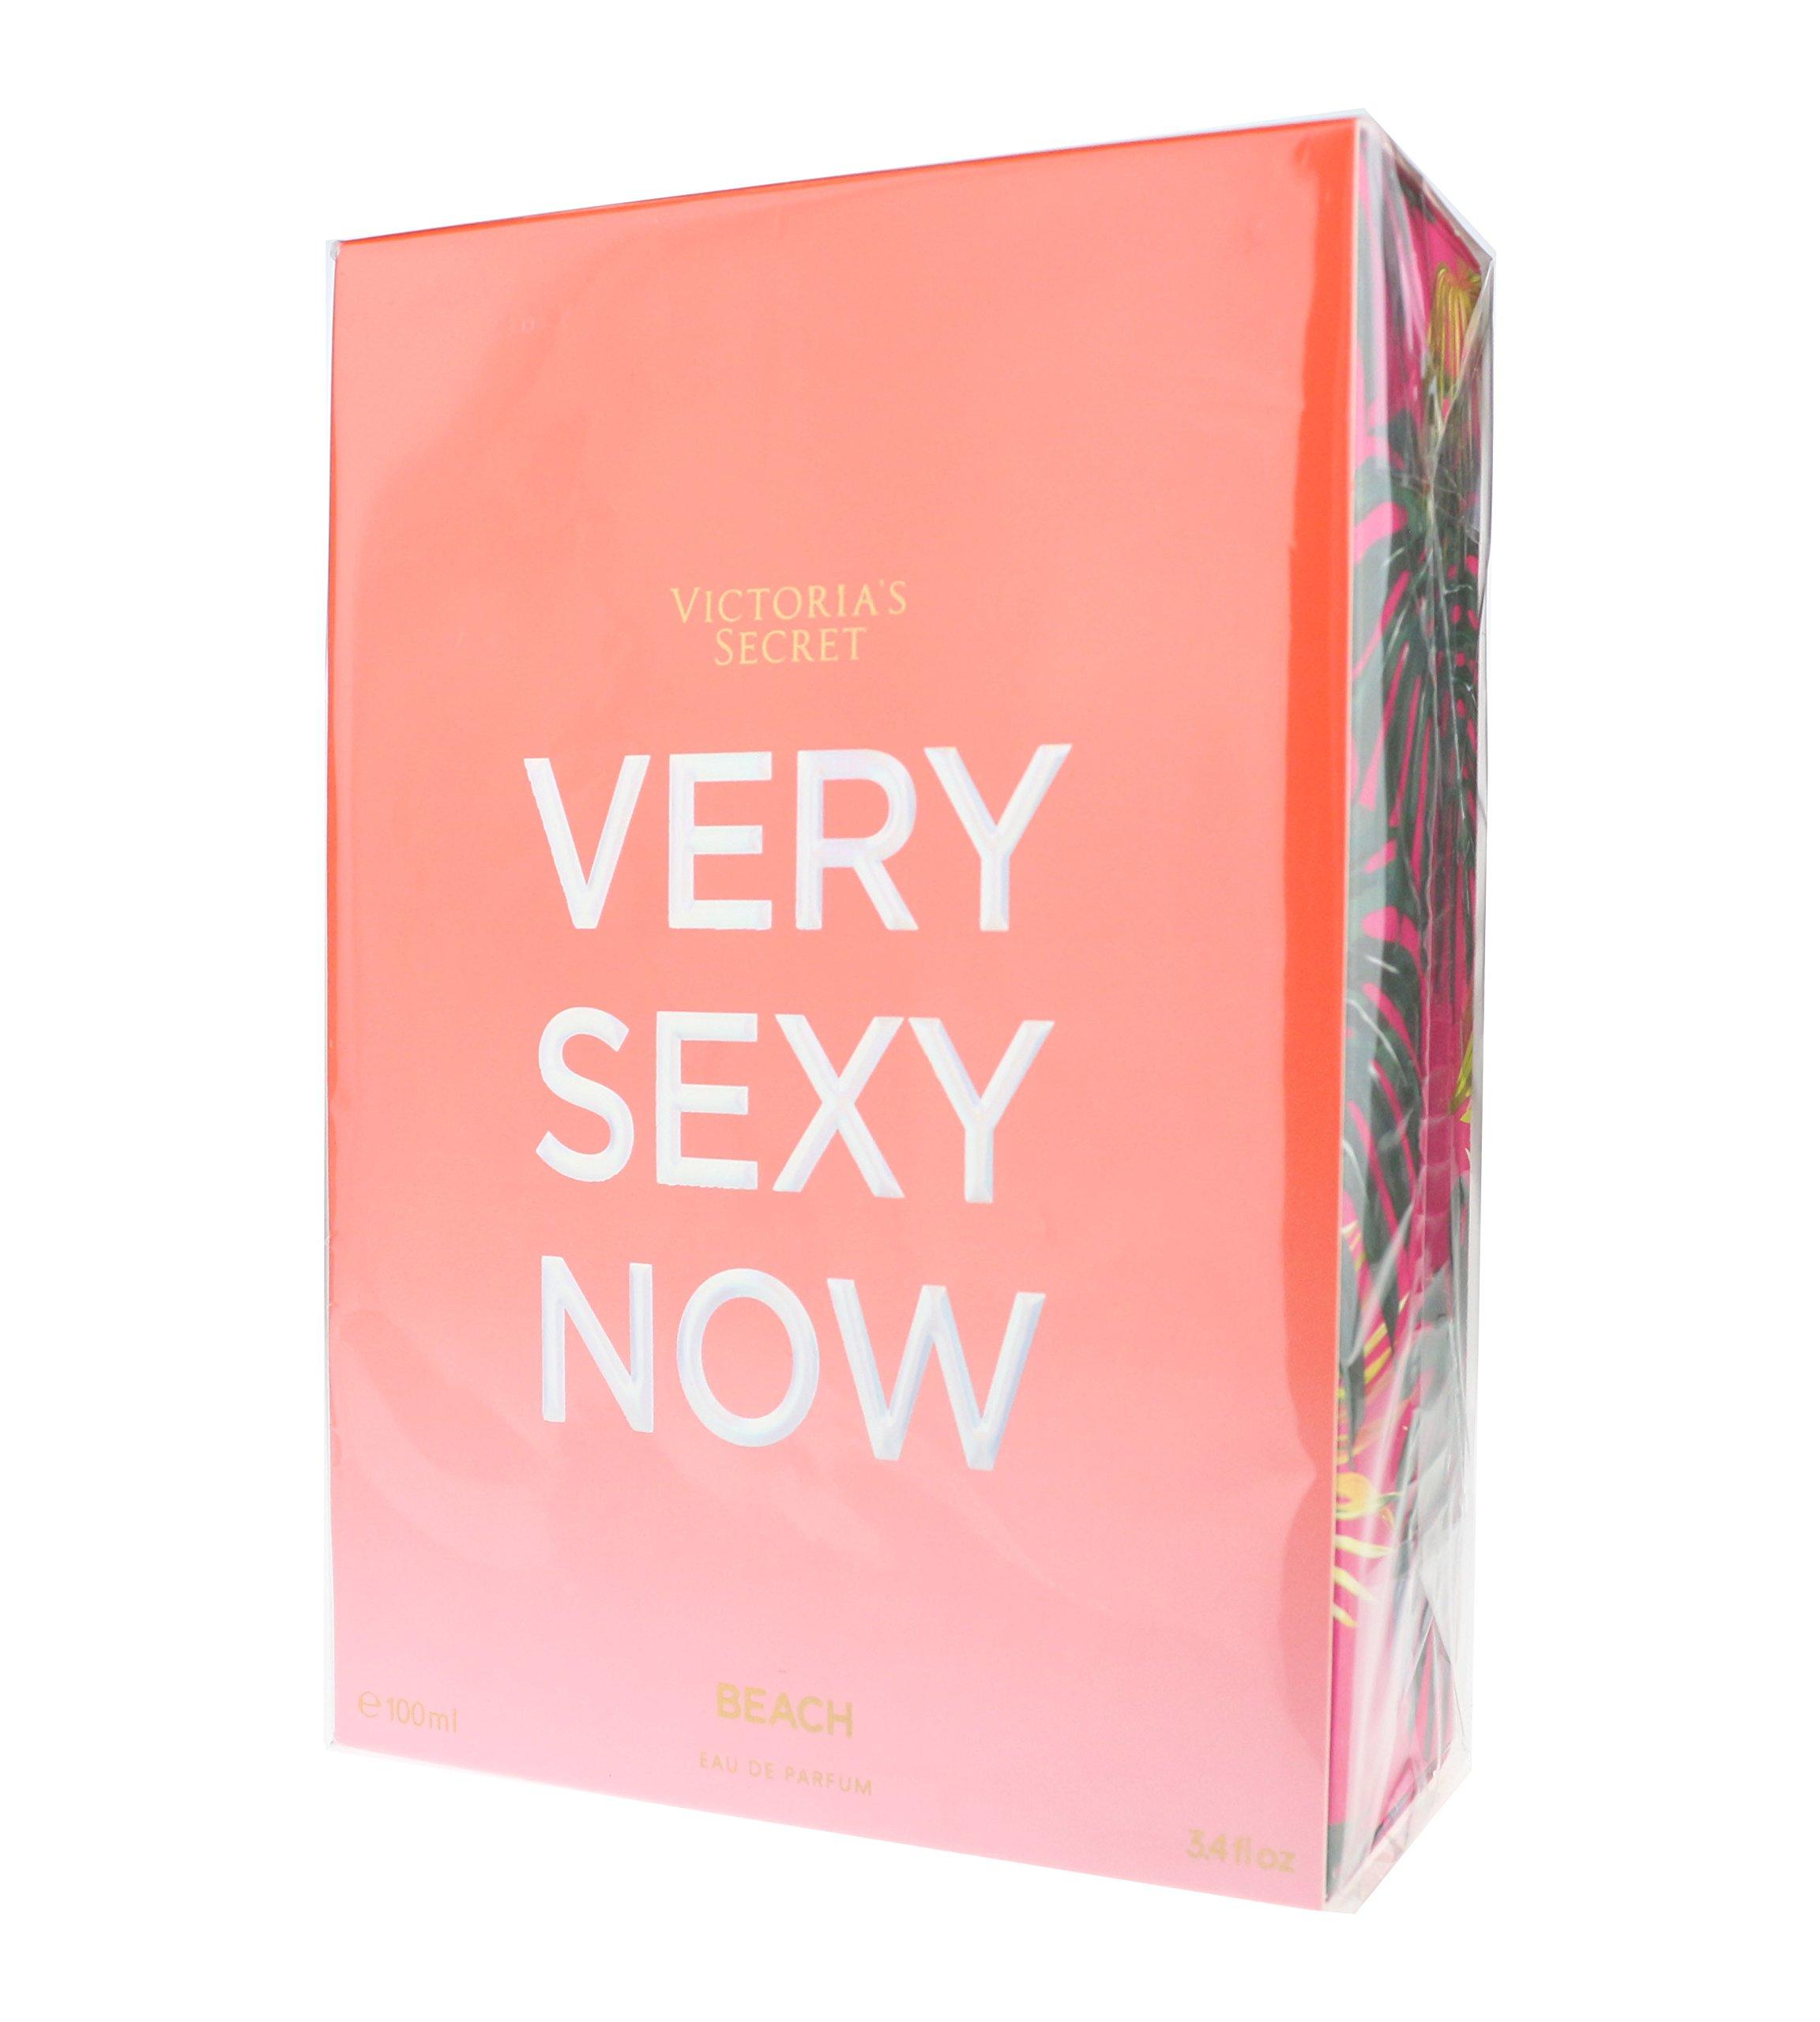 ac64670e972 Victoria s Secret Very Sexy Now Beach 3.4 Ounce (100 Milliliter) Eau De  Parfum Spray